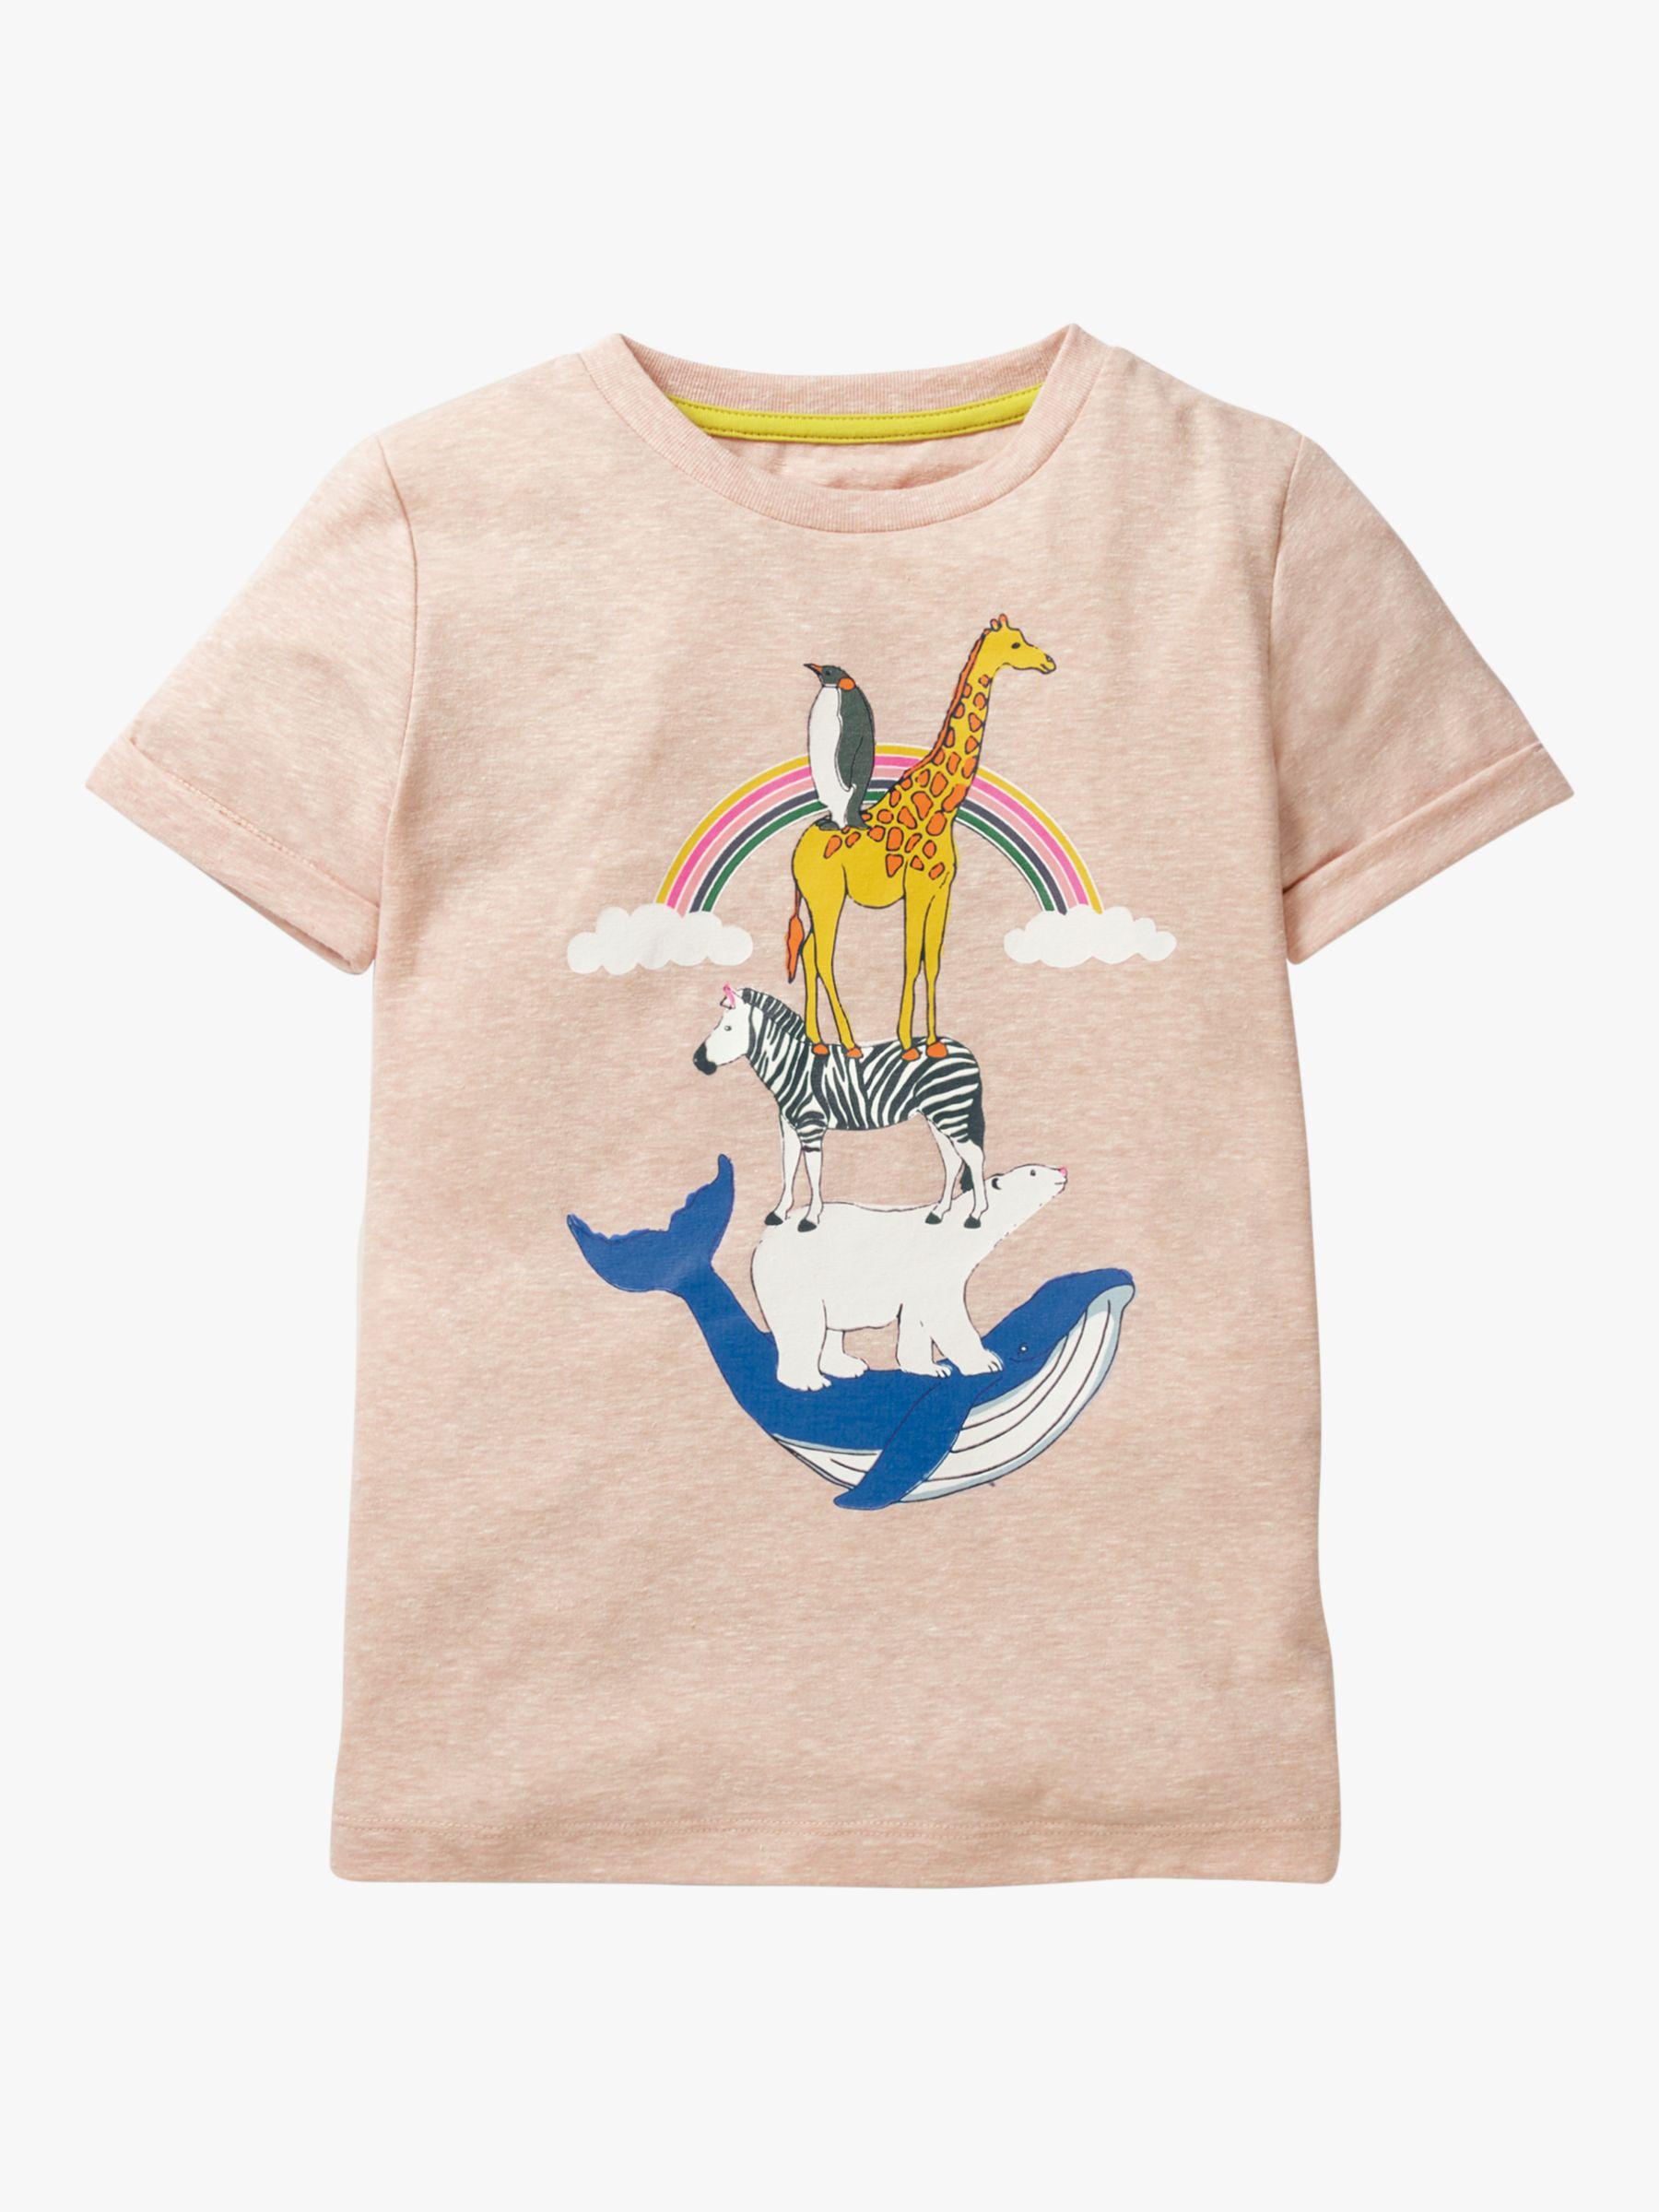 Mini Boden Mini Boden Girls' Around The World T-Shirt, Provence Dusty Pink